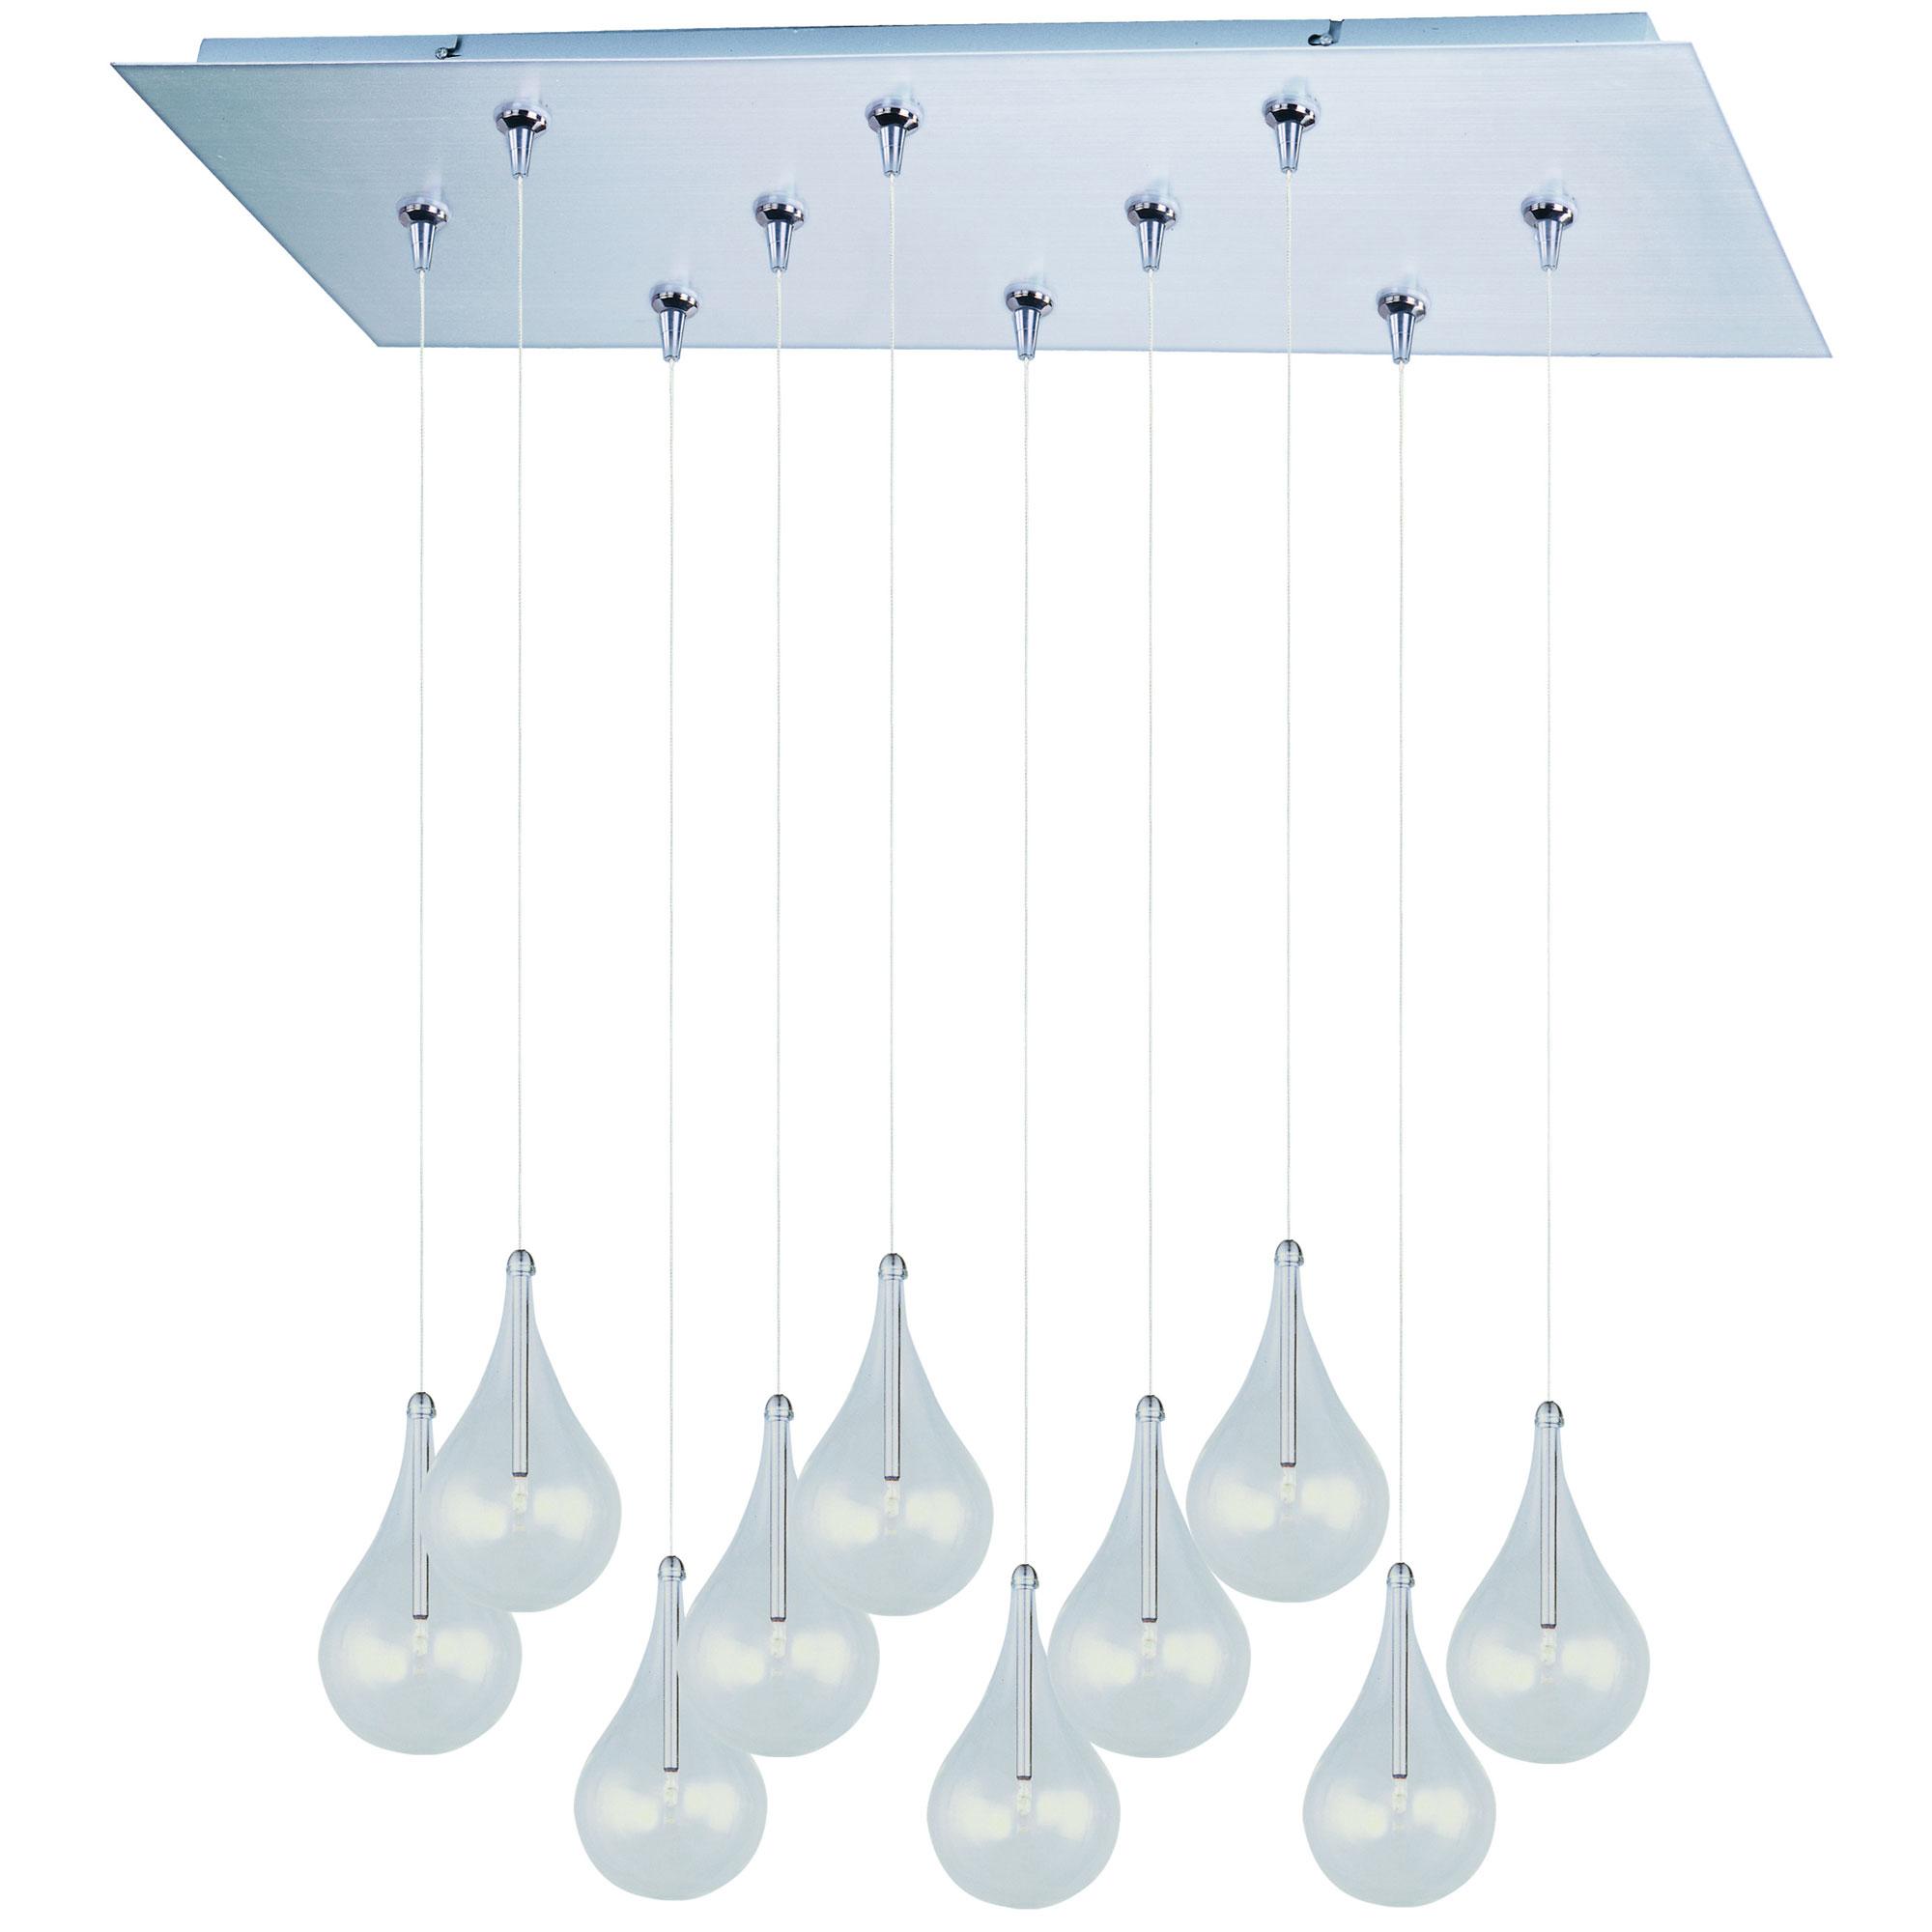 Larmes Multi Light Rapid Jack Pendant With Rectangle Canopy By Et2 E93910 18sn